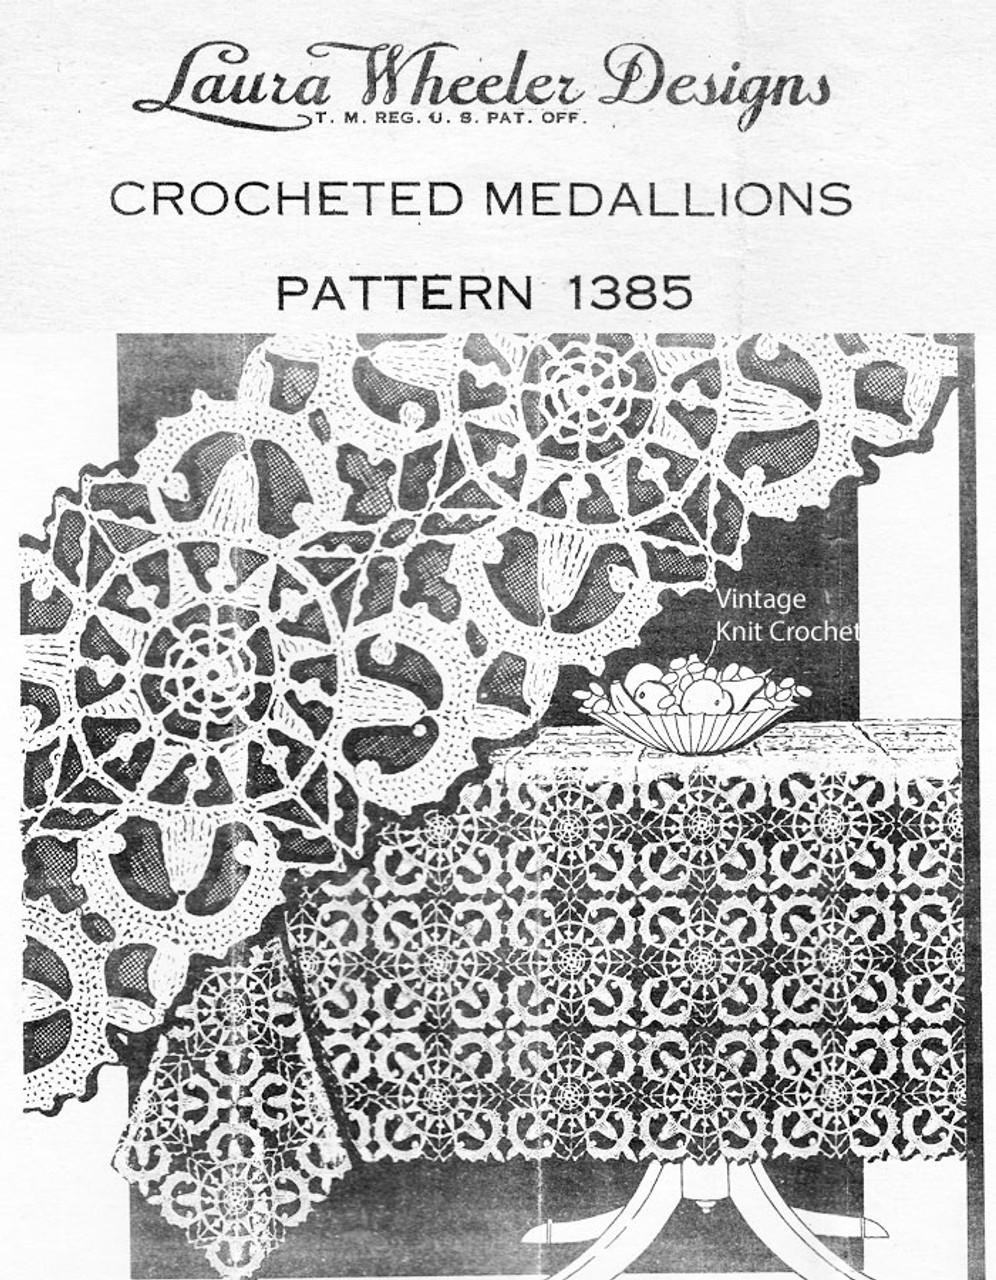 Crochet Medallion Tablecloth Pattern, Mail Order Design 1385